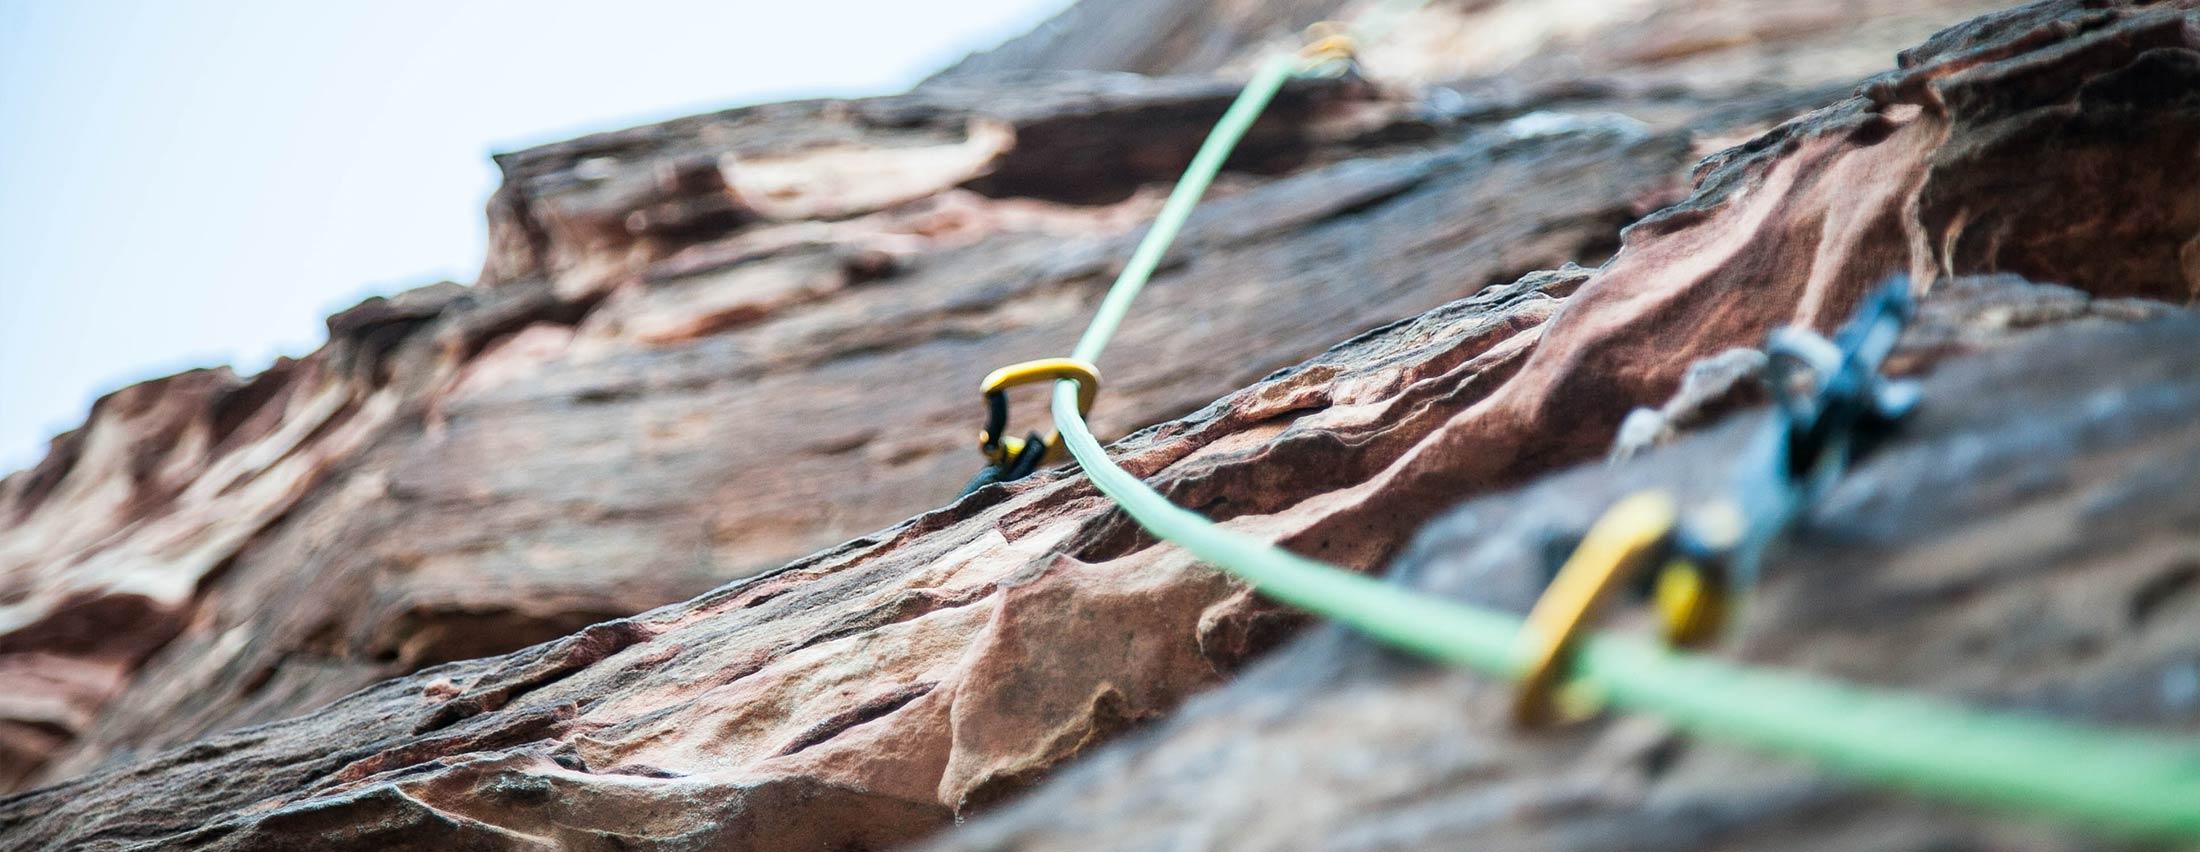 Rock Climbing & The Imagination